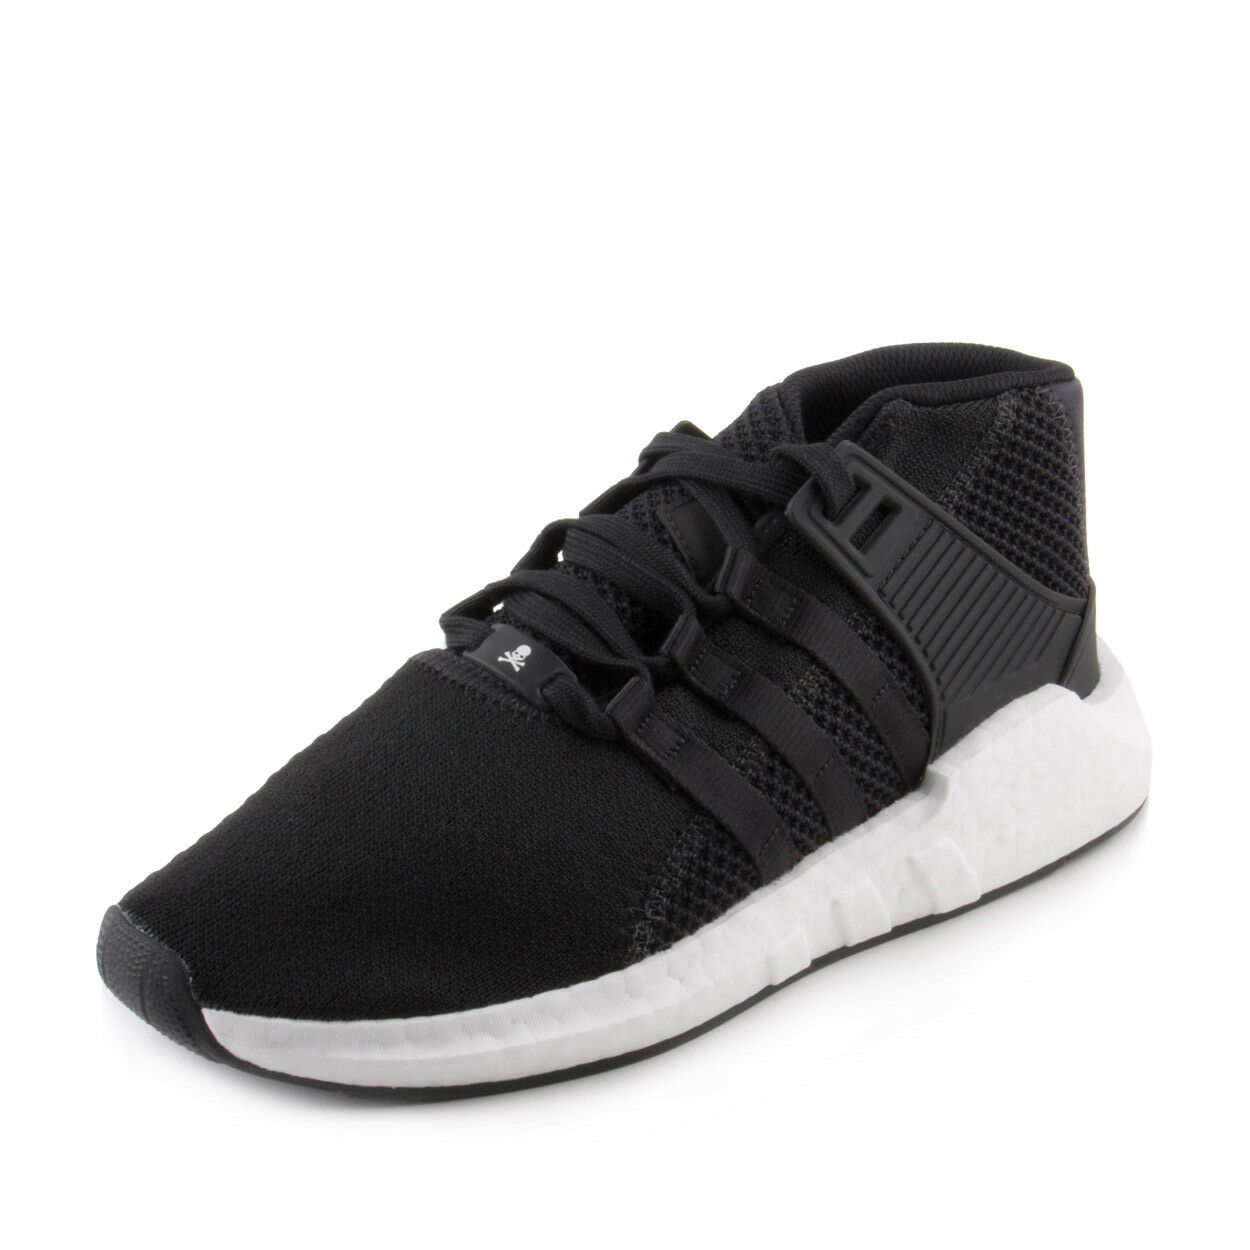 Adidas Uomo EQT Support MID MMW  MasterMind MasterMind MasterMind  nero bianca CQ1824 fa222f